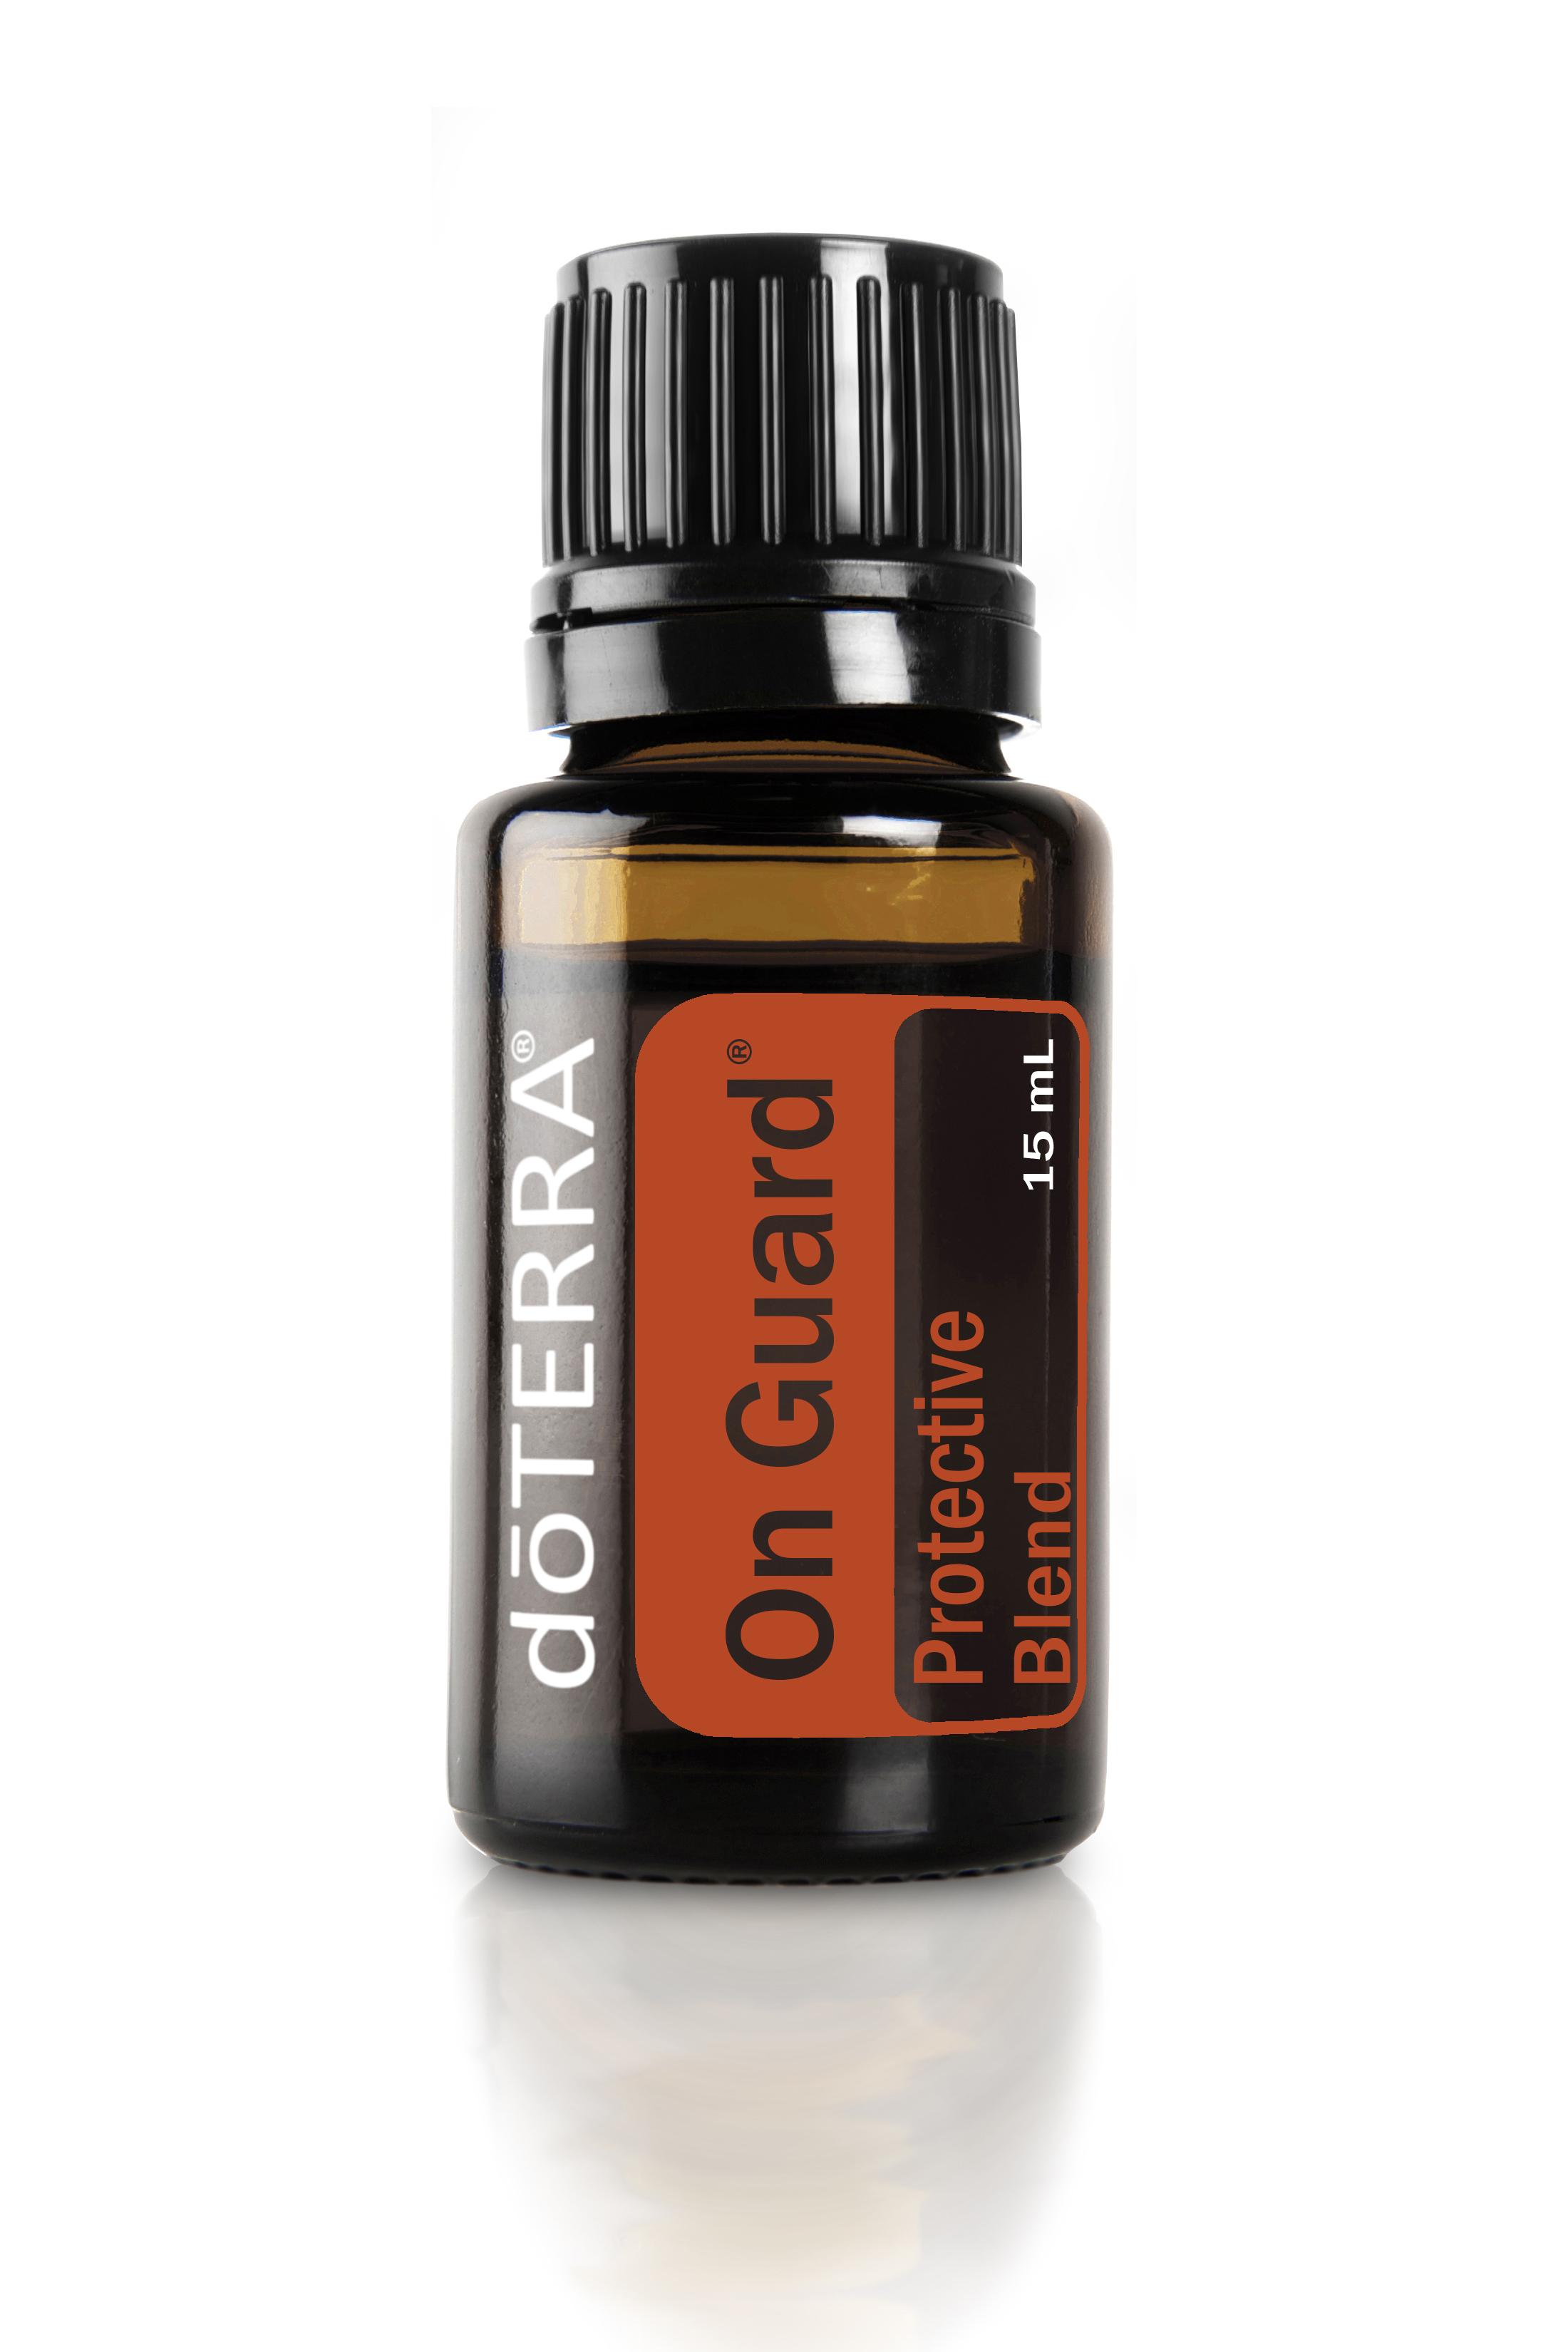 OnGuard Essential Oils Blend